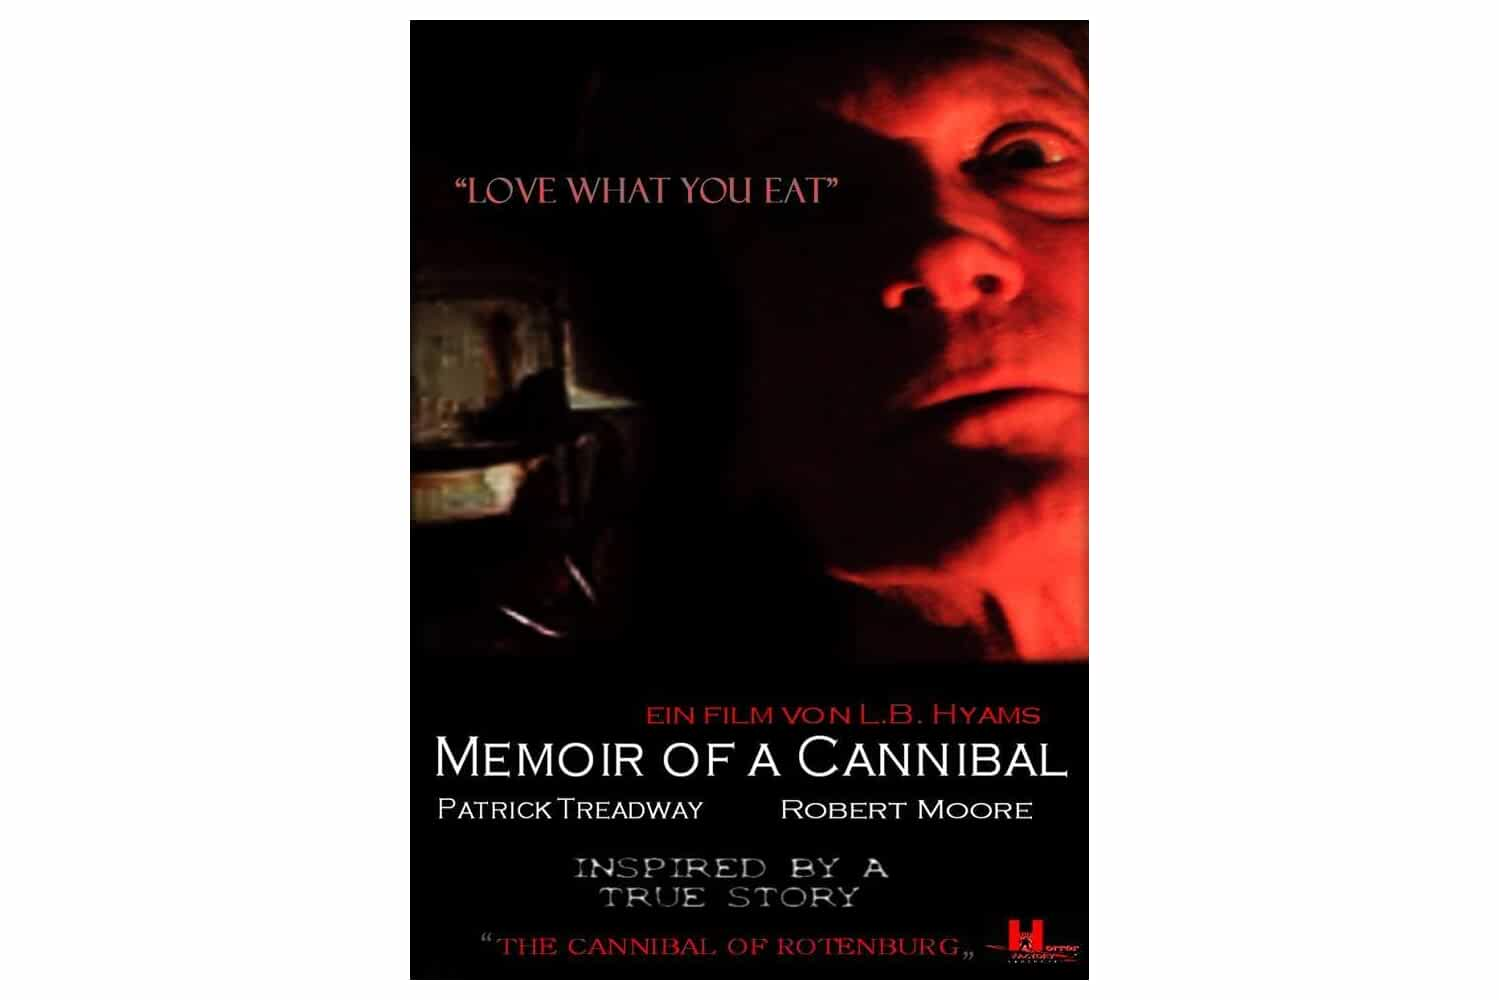 Memoir of a Cannibal (2018)